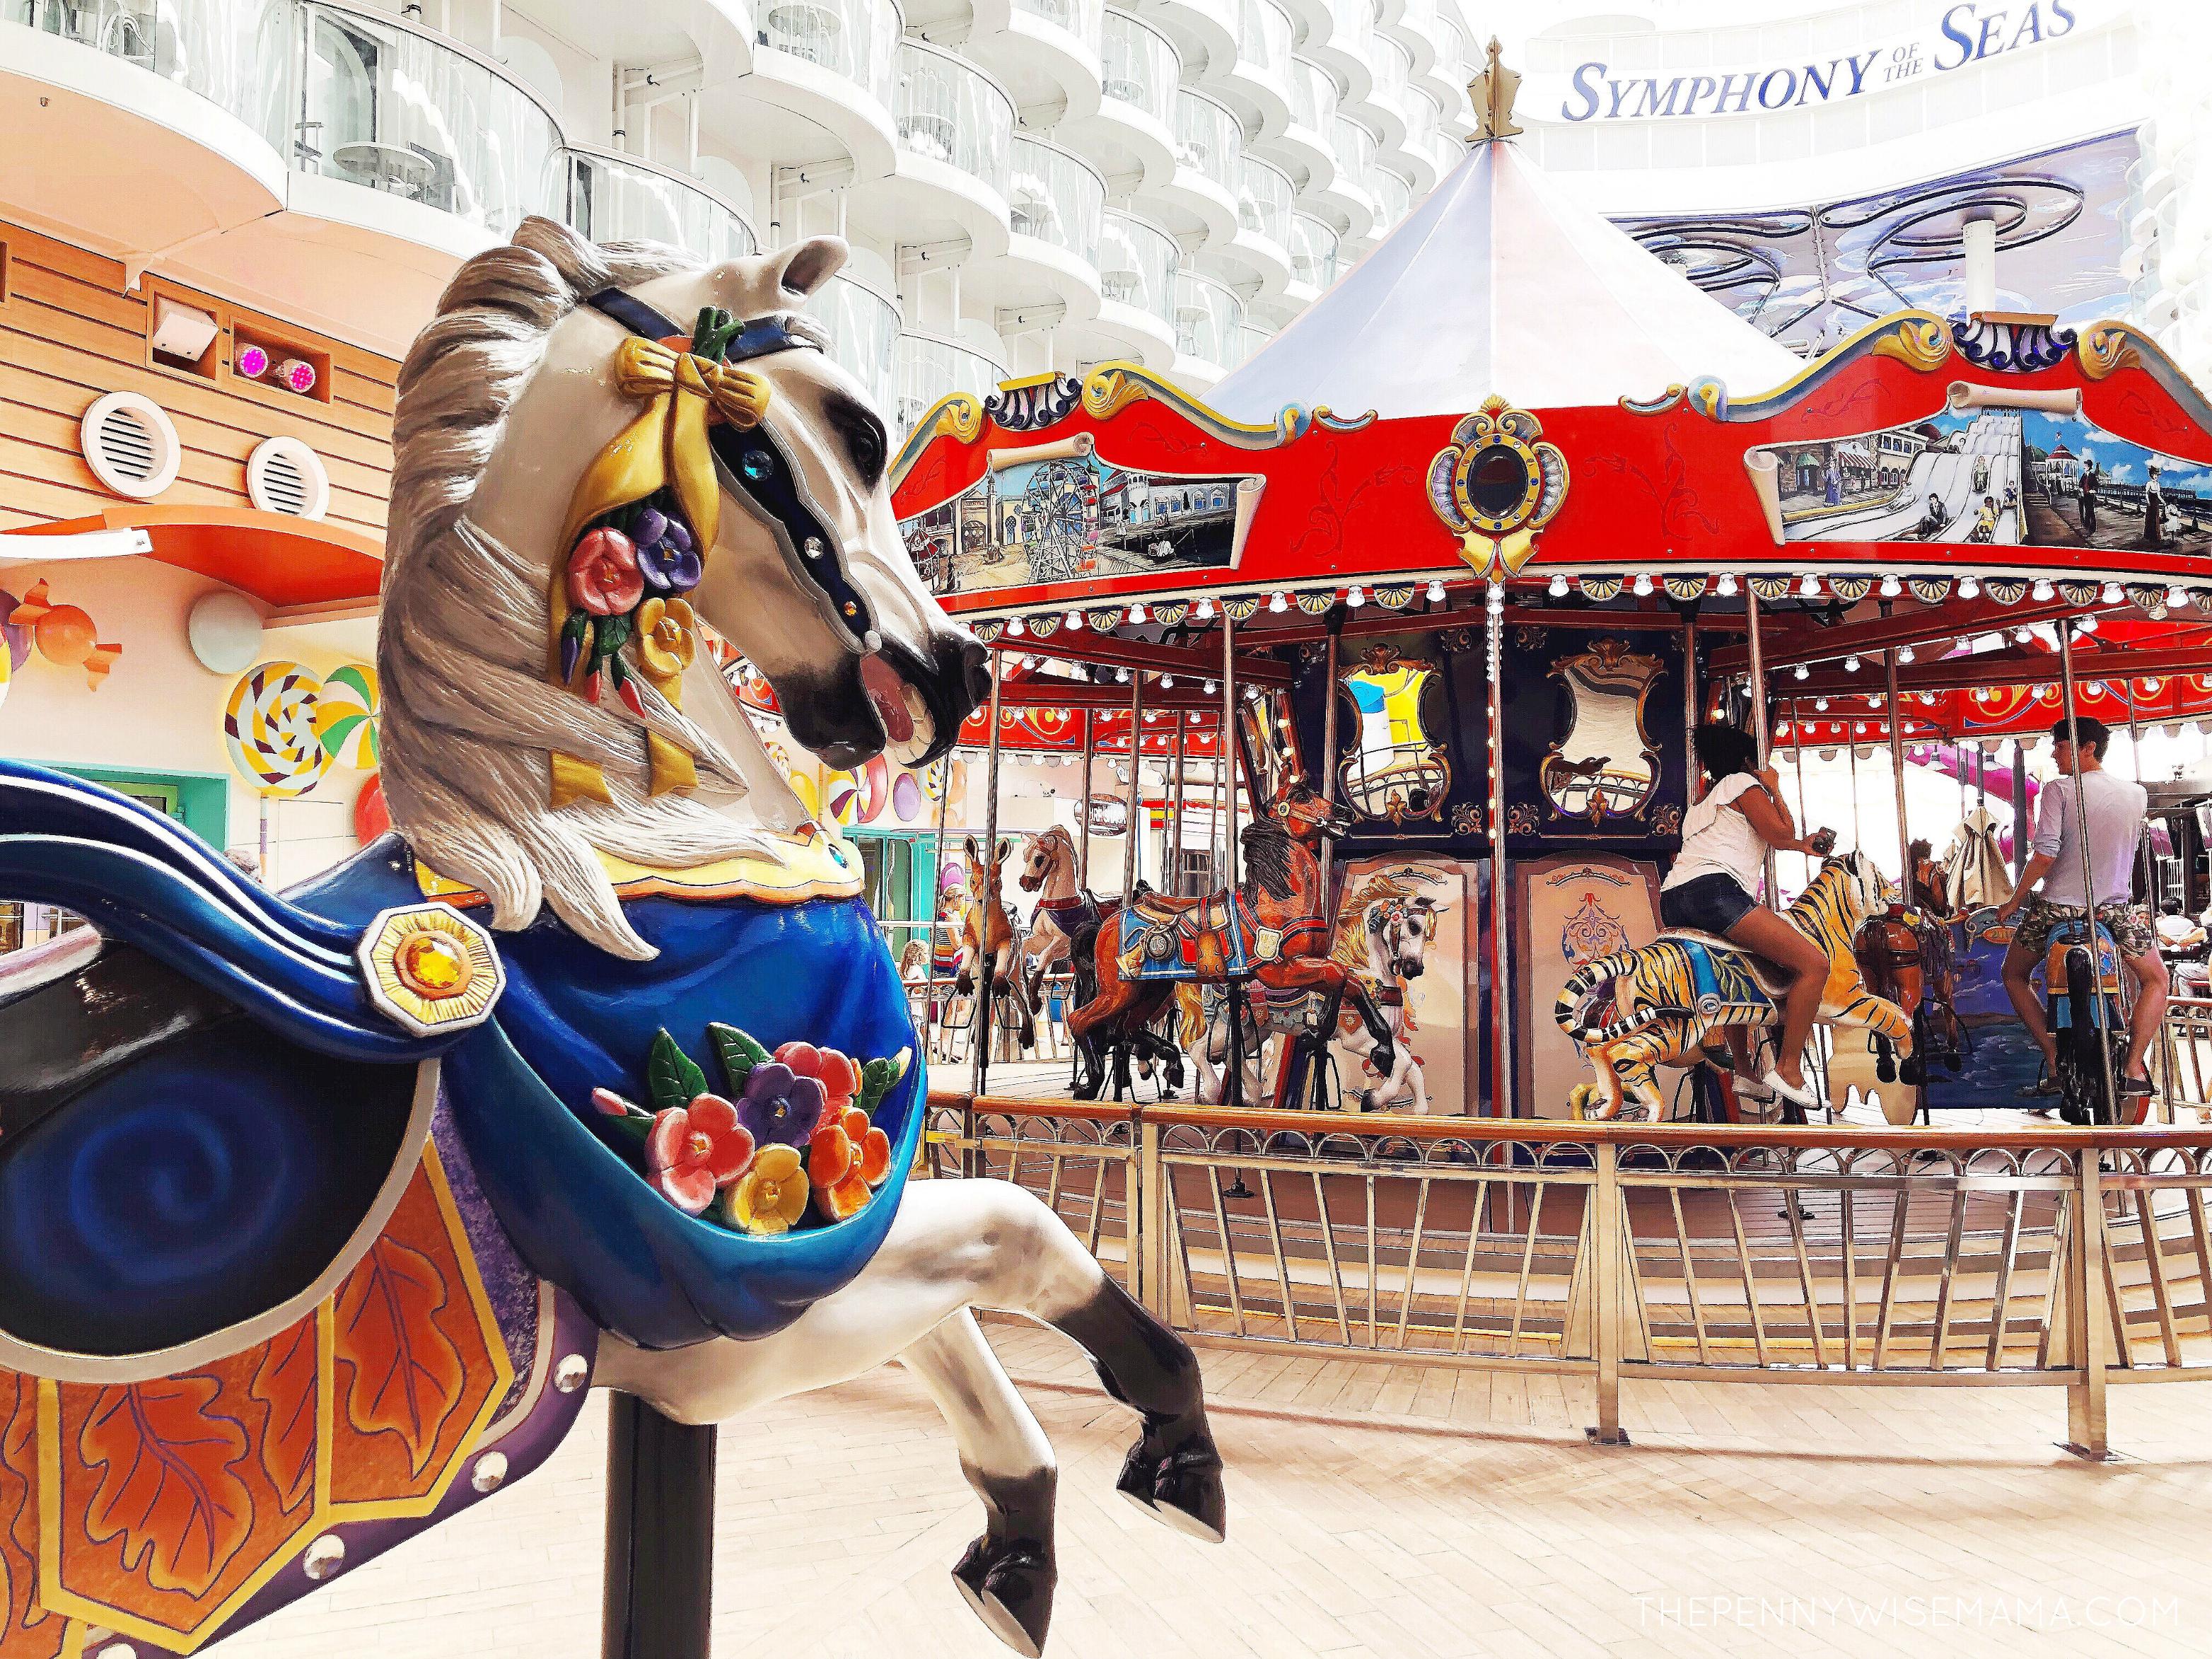 Symphony of the Seas Boardwalk Carousel